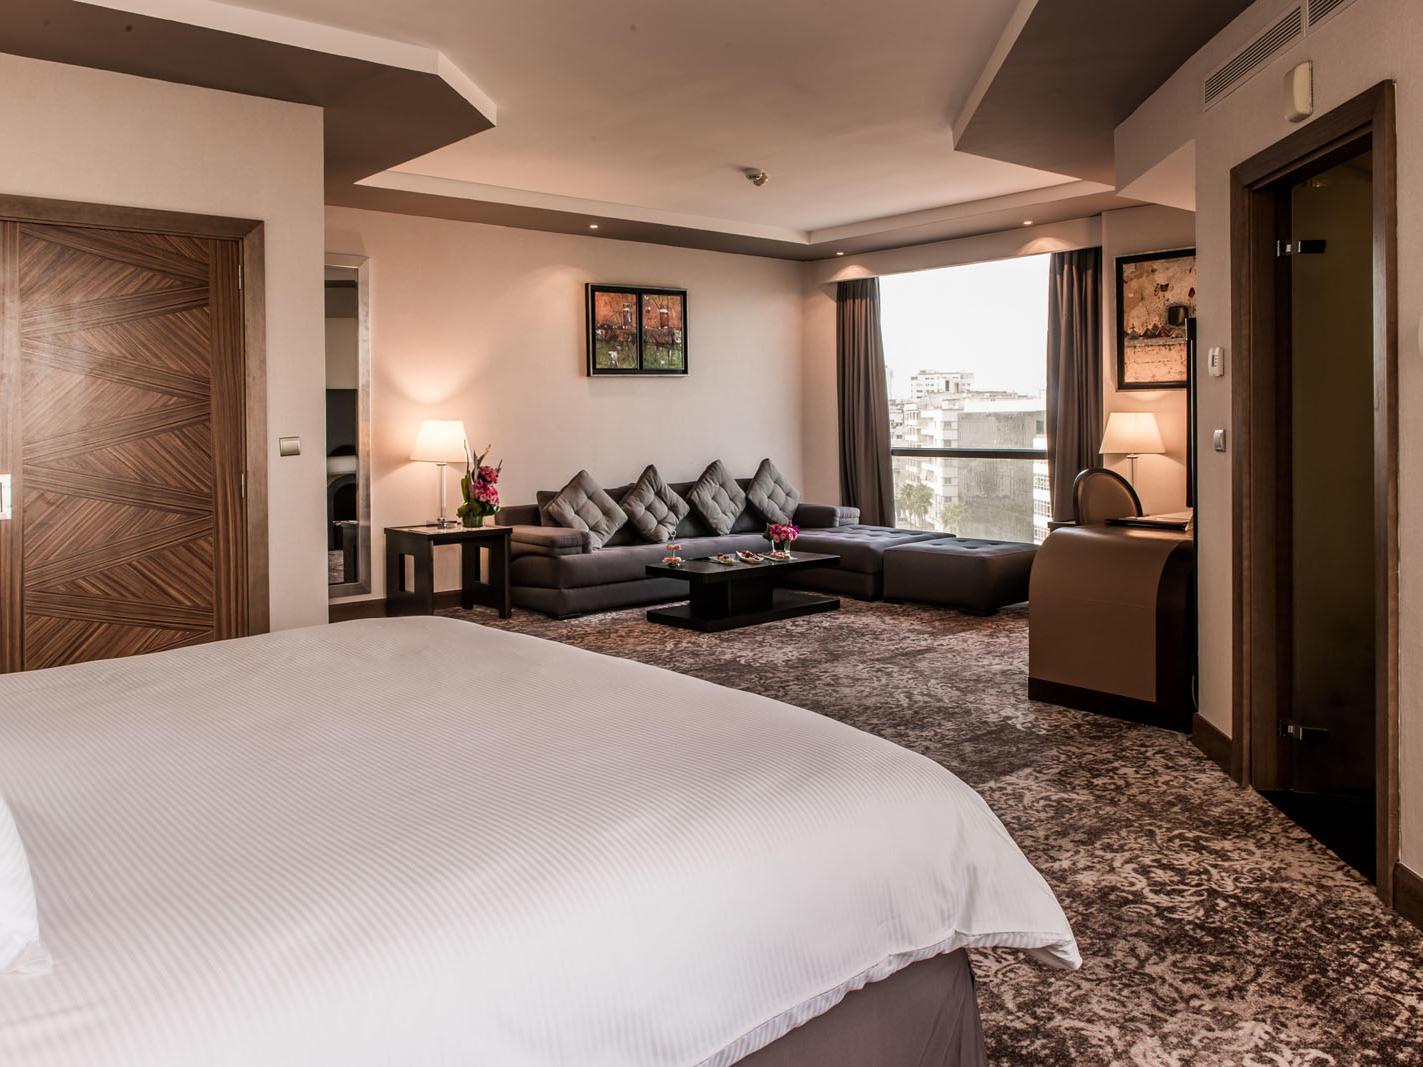 Junior Suite at Kenzi Tower Hotel in Casablanca, Morocco